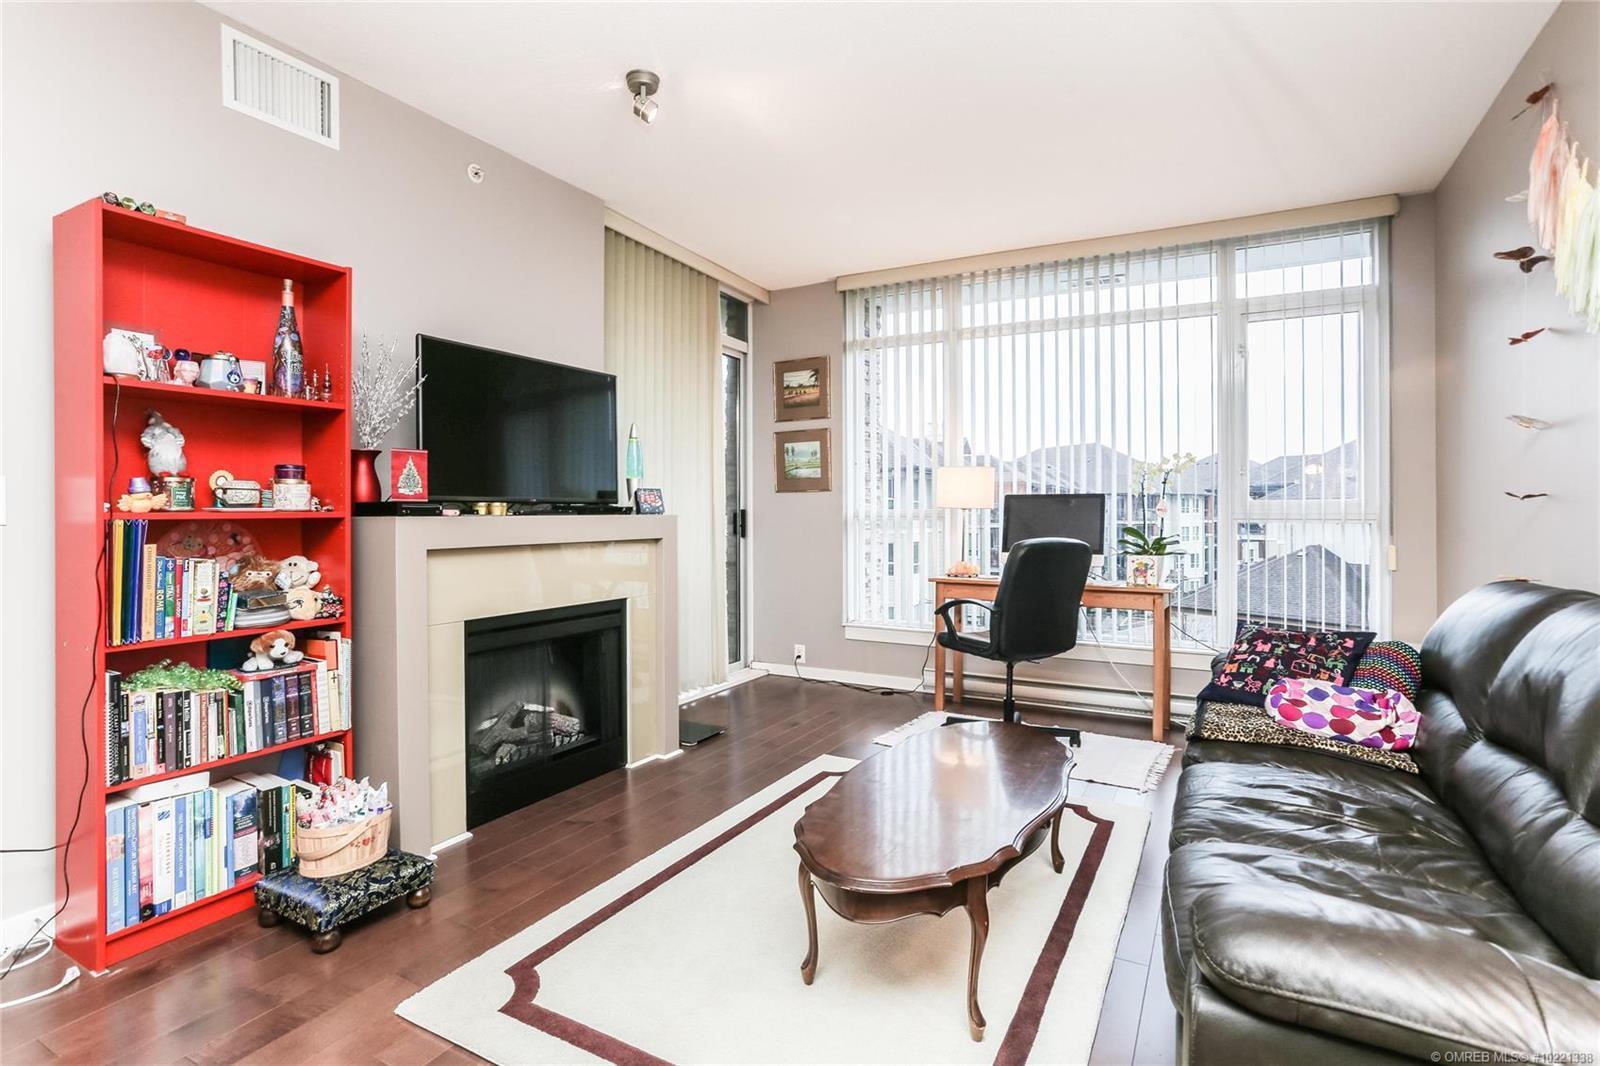 #404 1075 Sunset Drive, - Kelowna Apartment for sale, 1 Bedroom (10221338) - #8